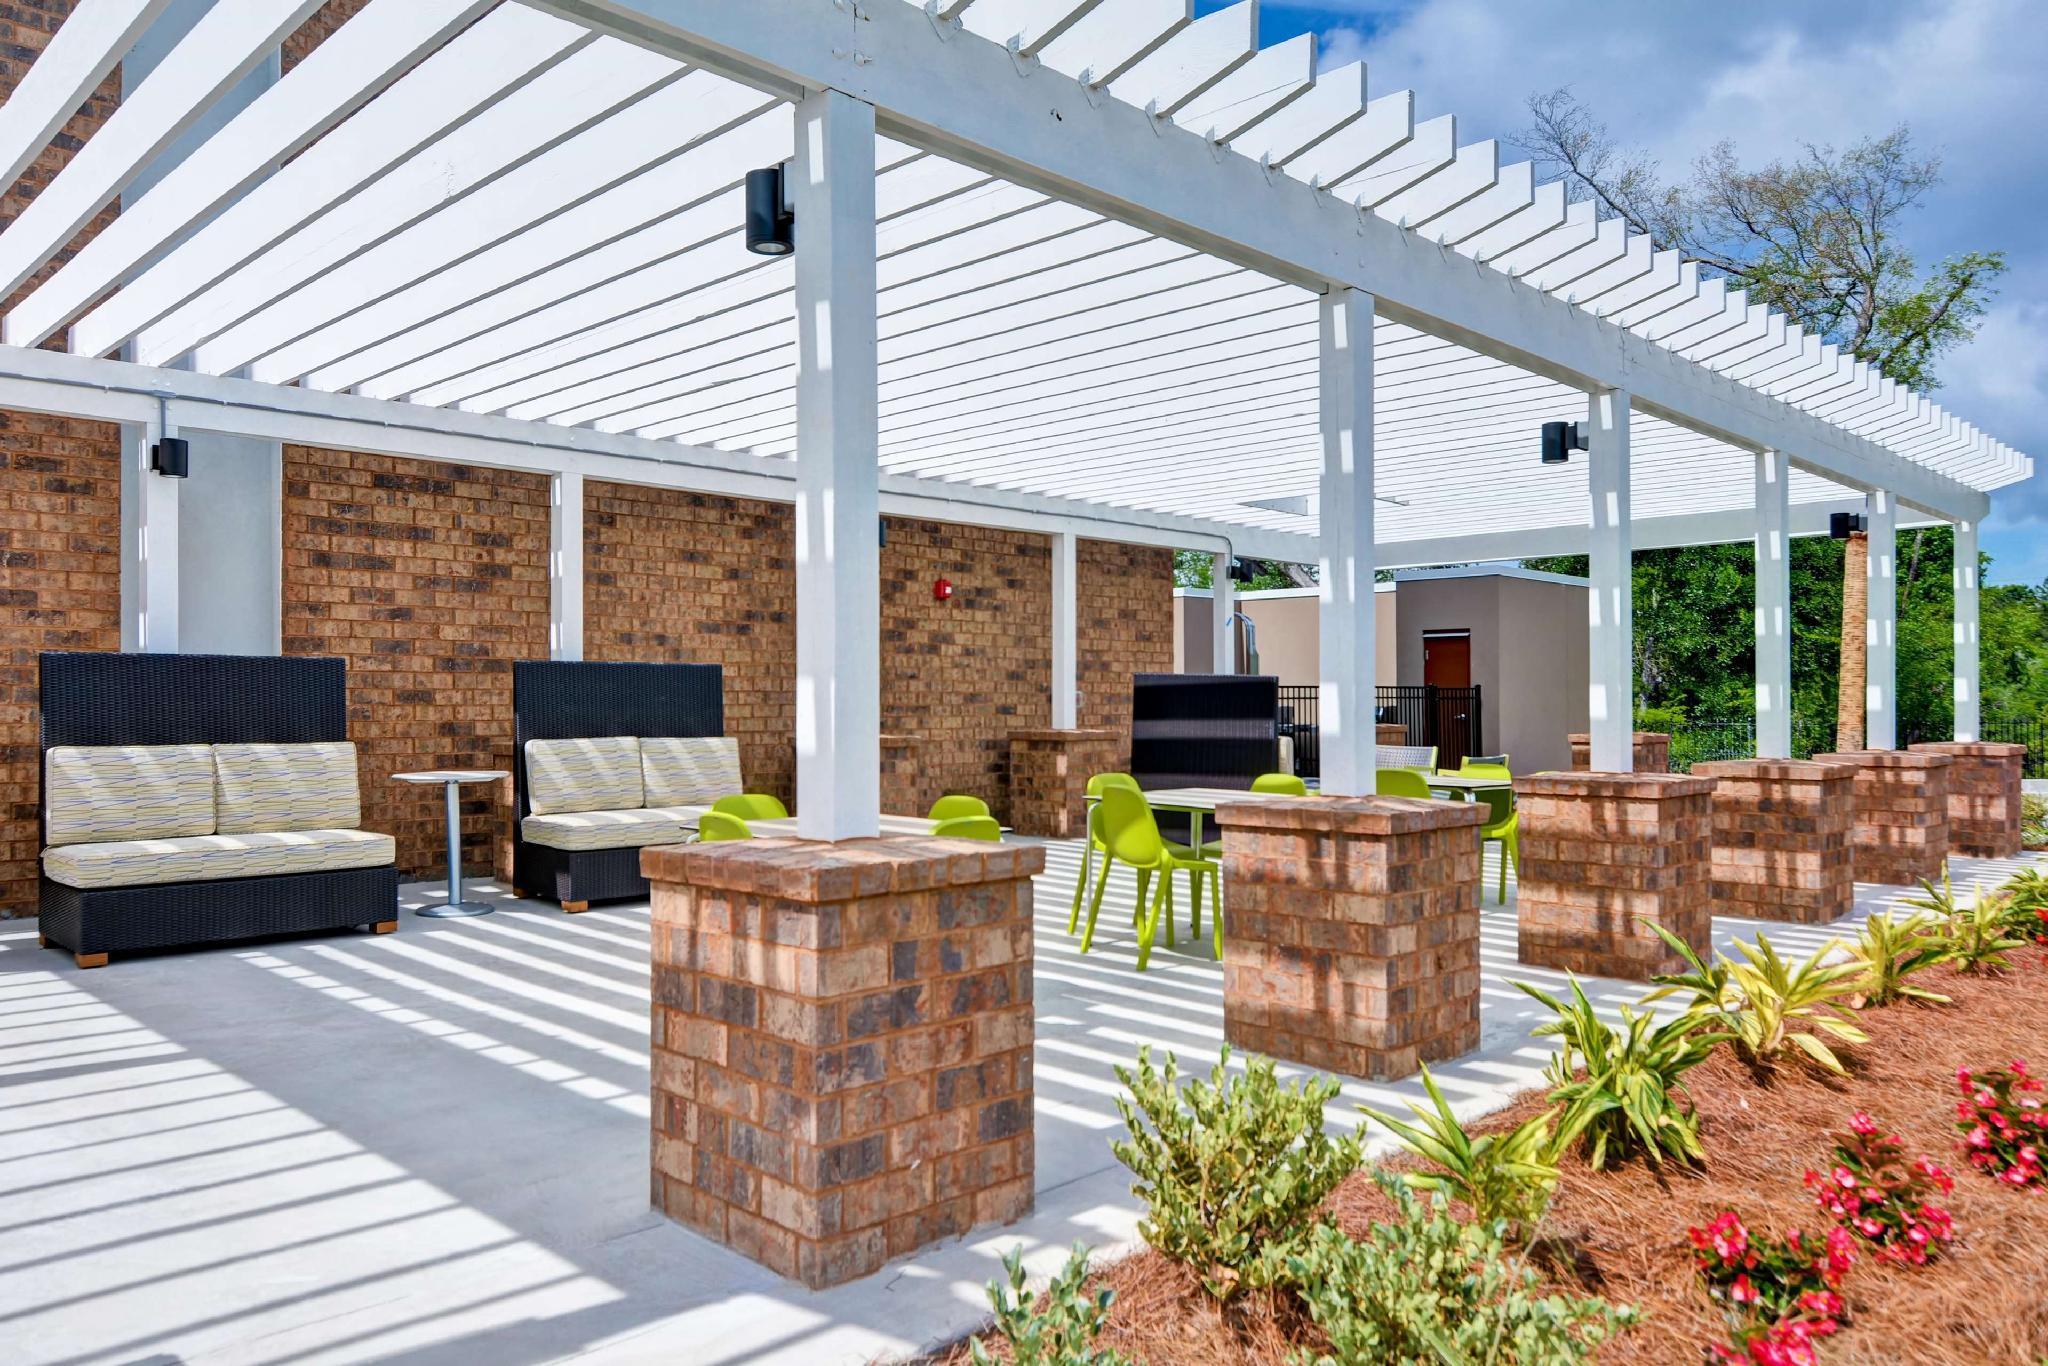 Home2 Suites By Hilton Harrisburg